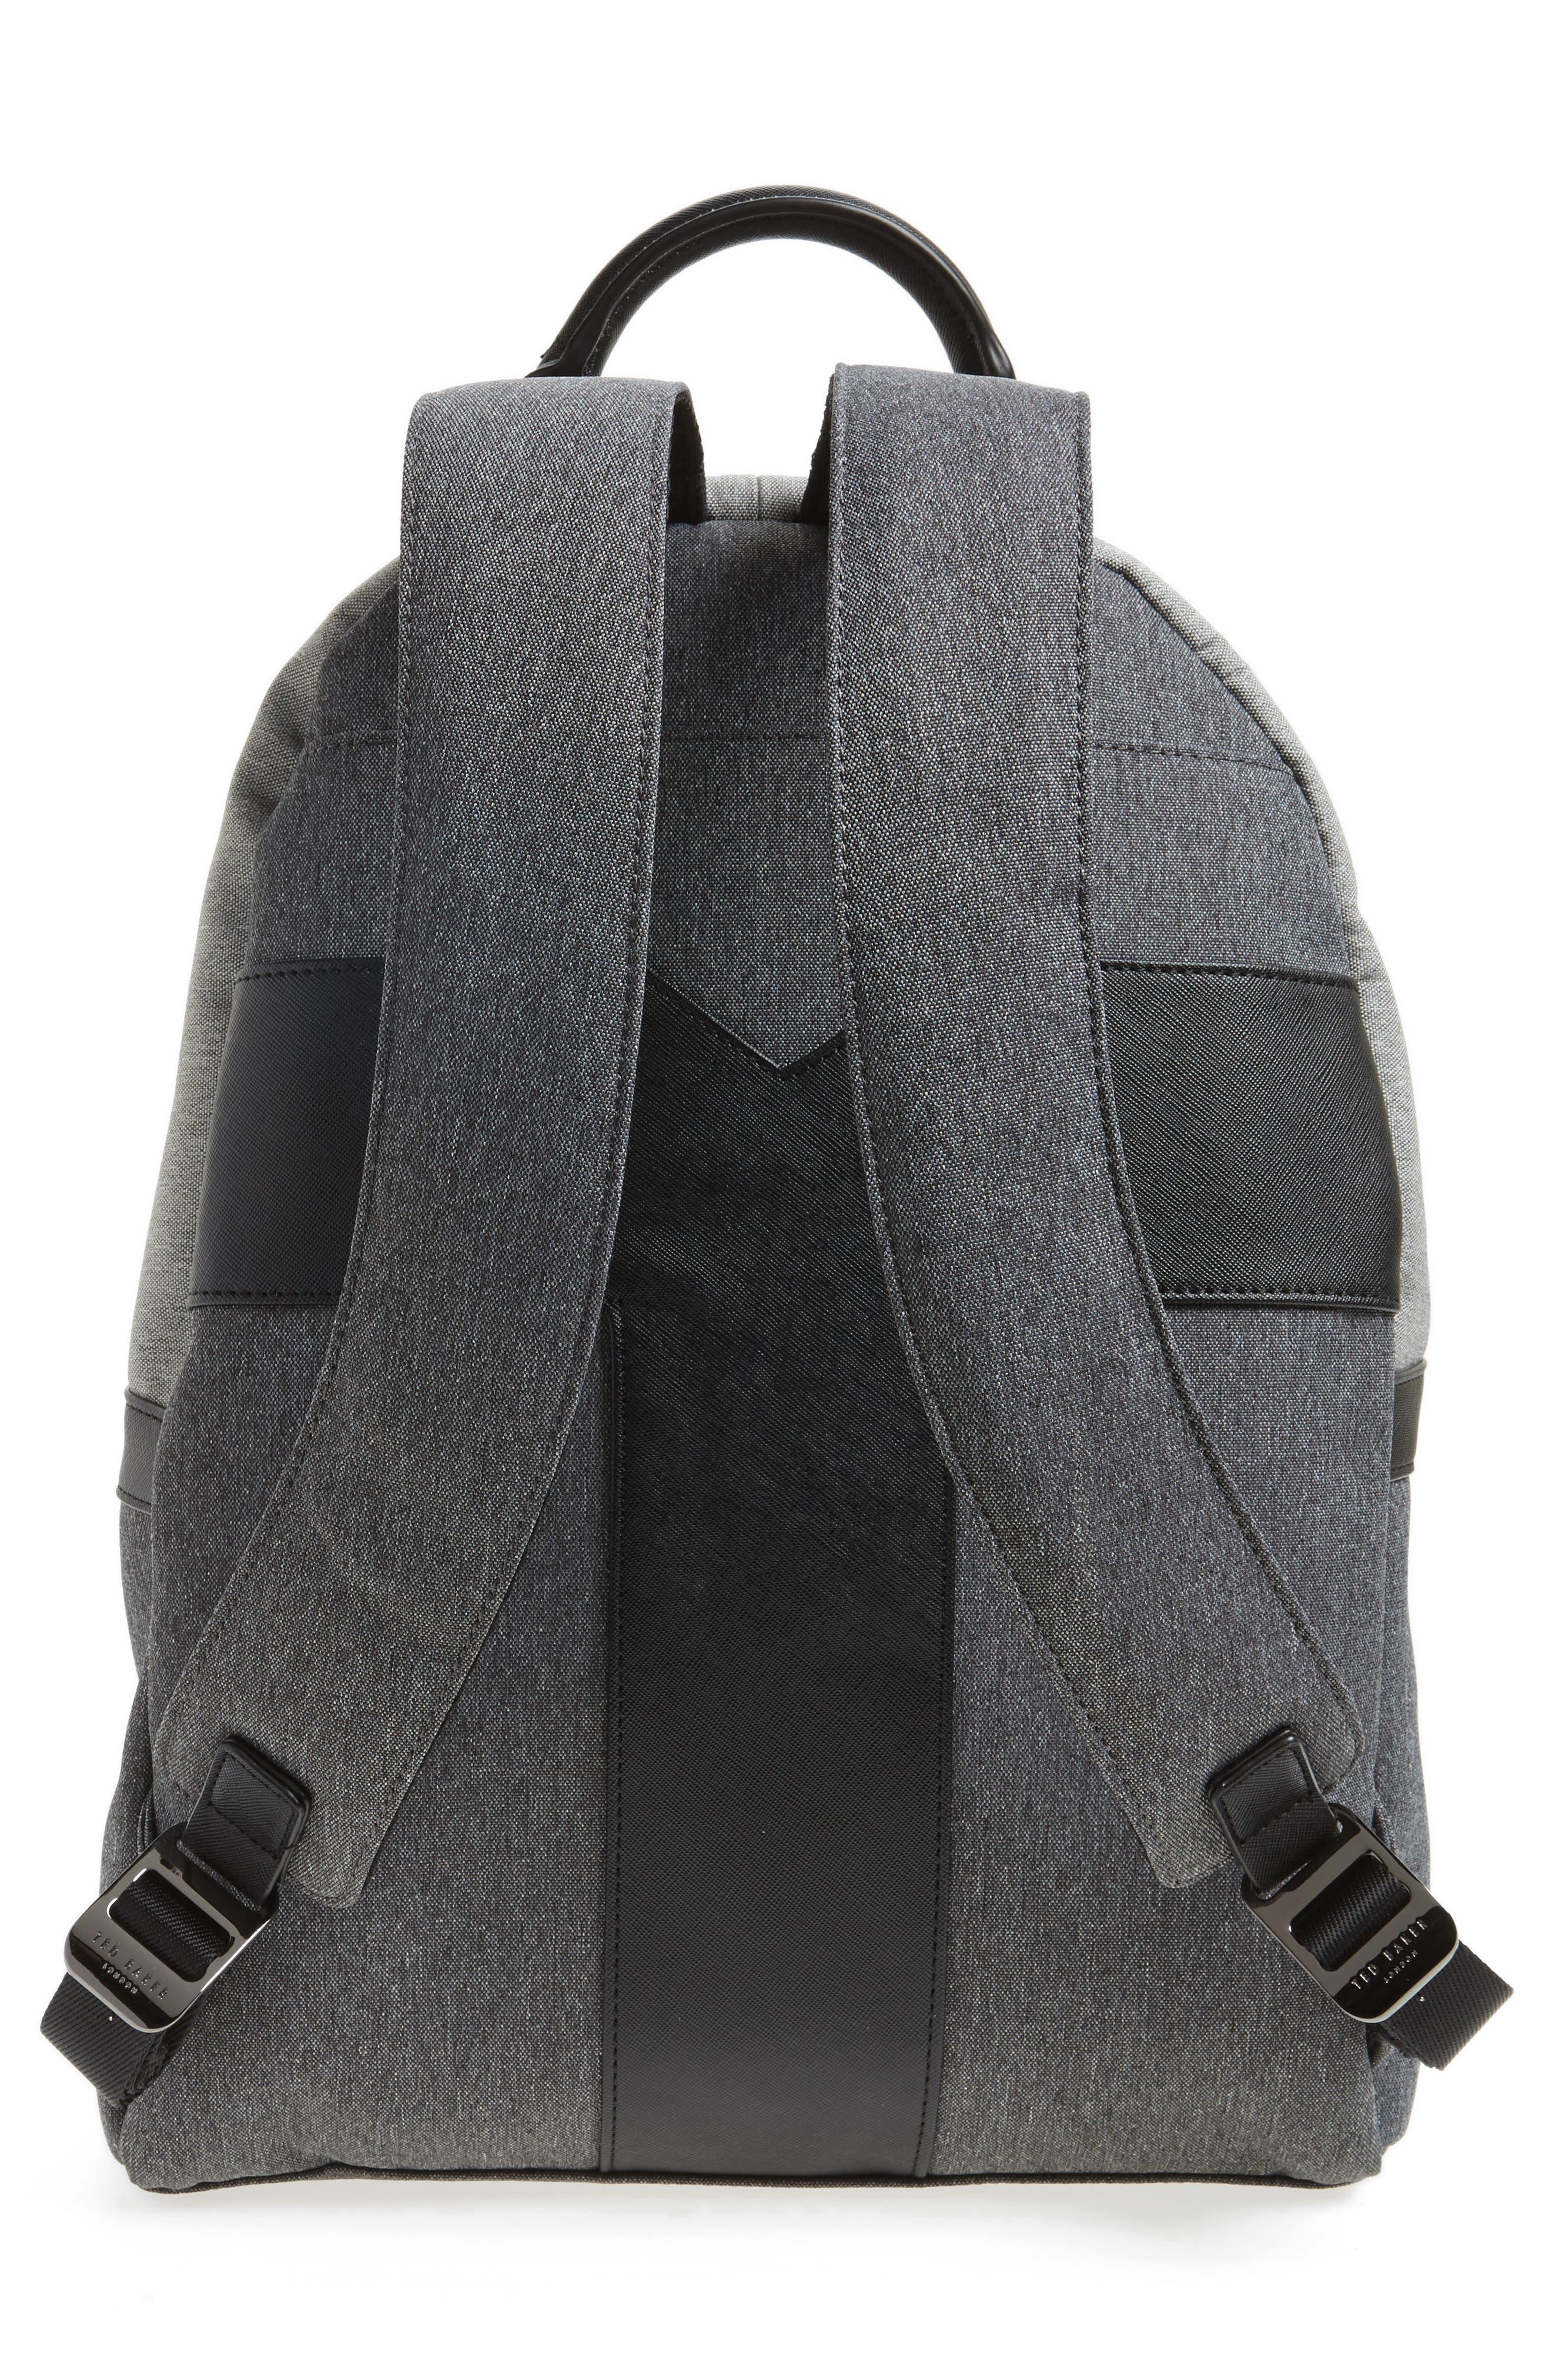 Zirabi Backpack,                             Alternate thumbnail 3, color,                             030